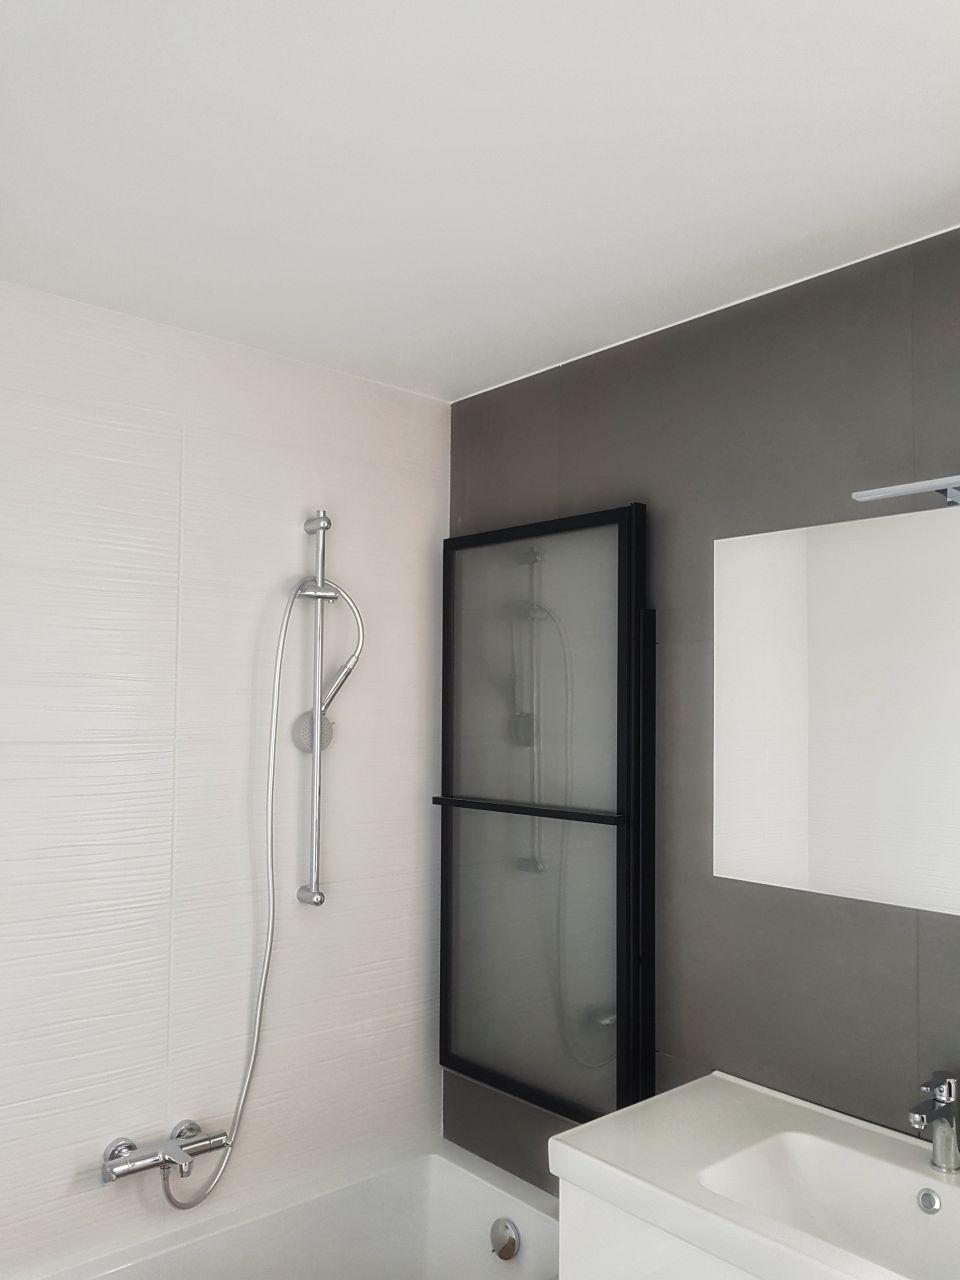 Salle de bain peinte